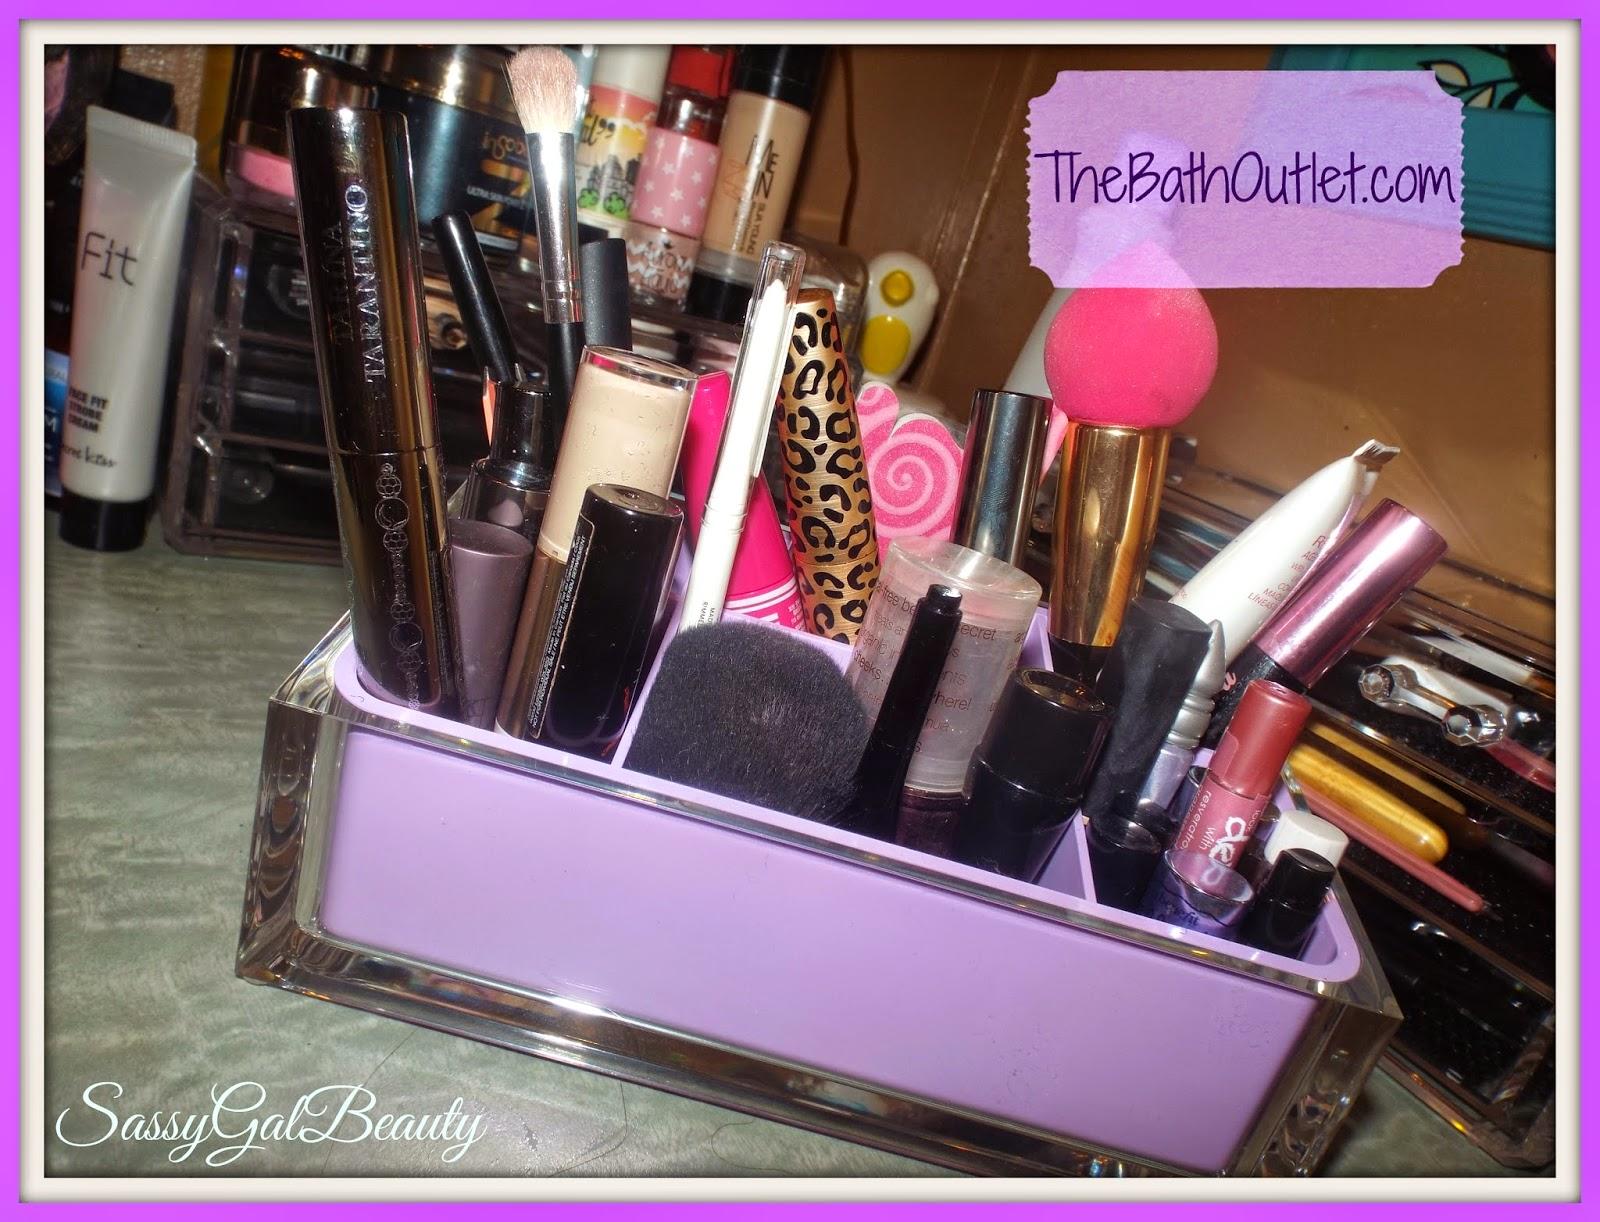 The Bath Outlet: Rainbow Line Makeup Organizer